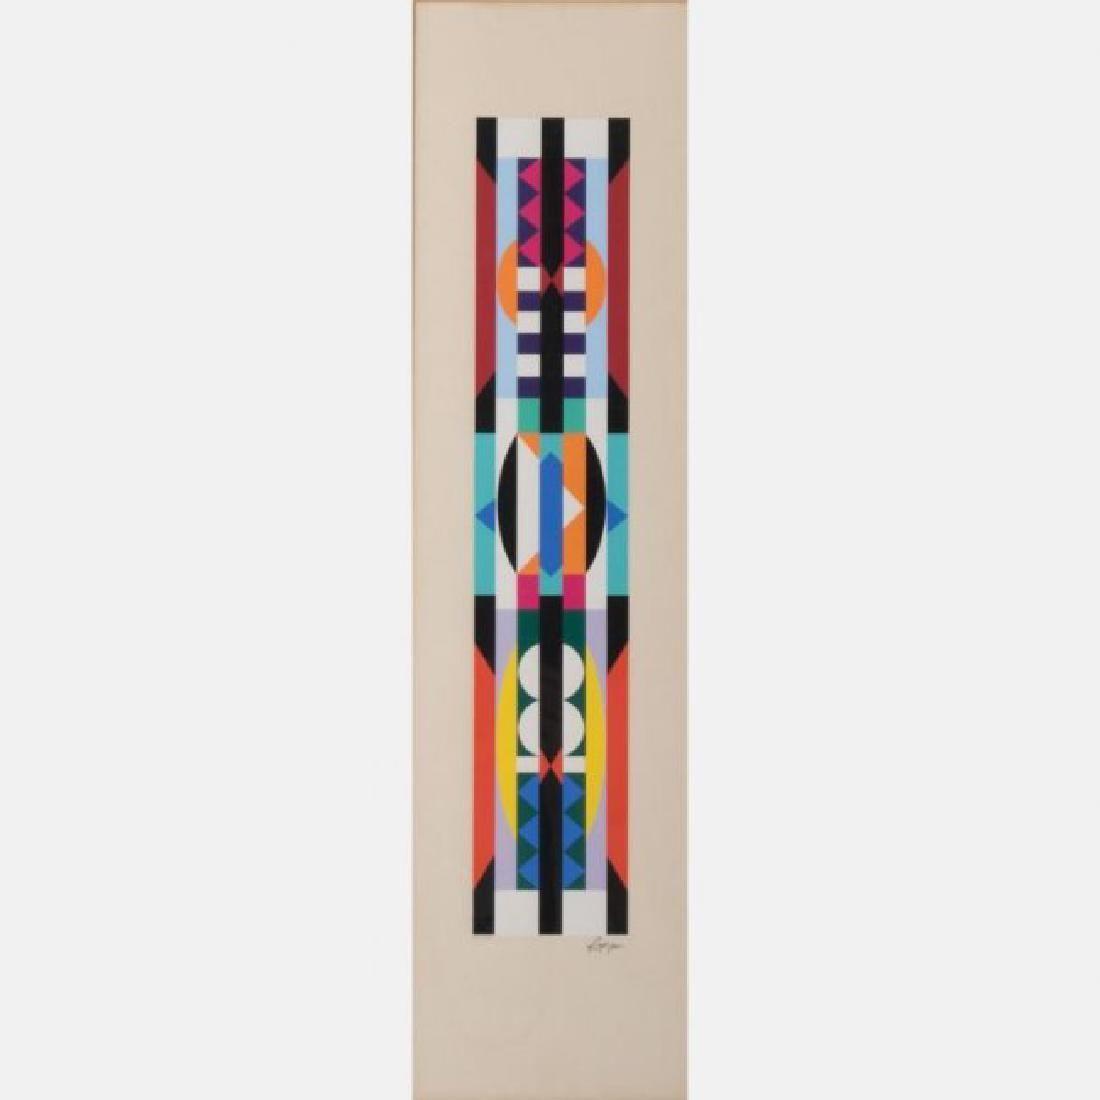 Yaacov Agam (b. 1928) Untitled, ca. 1970, Silkscreen